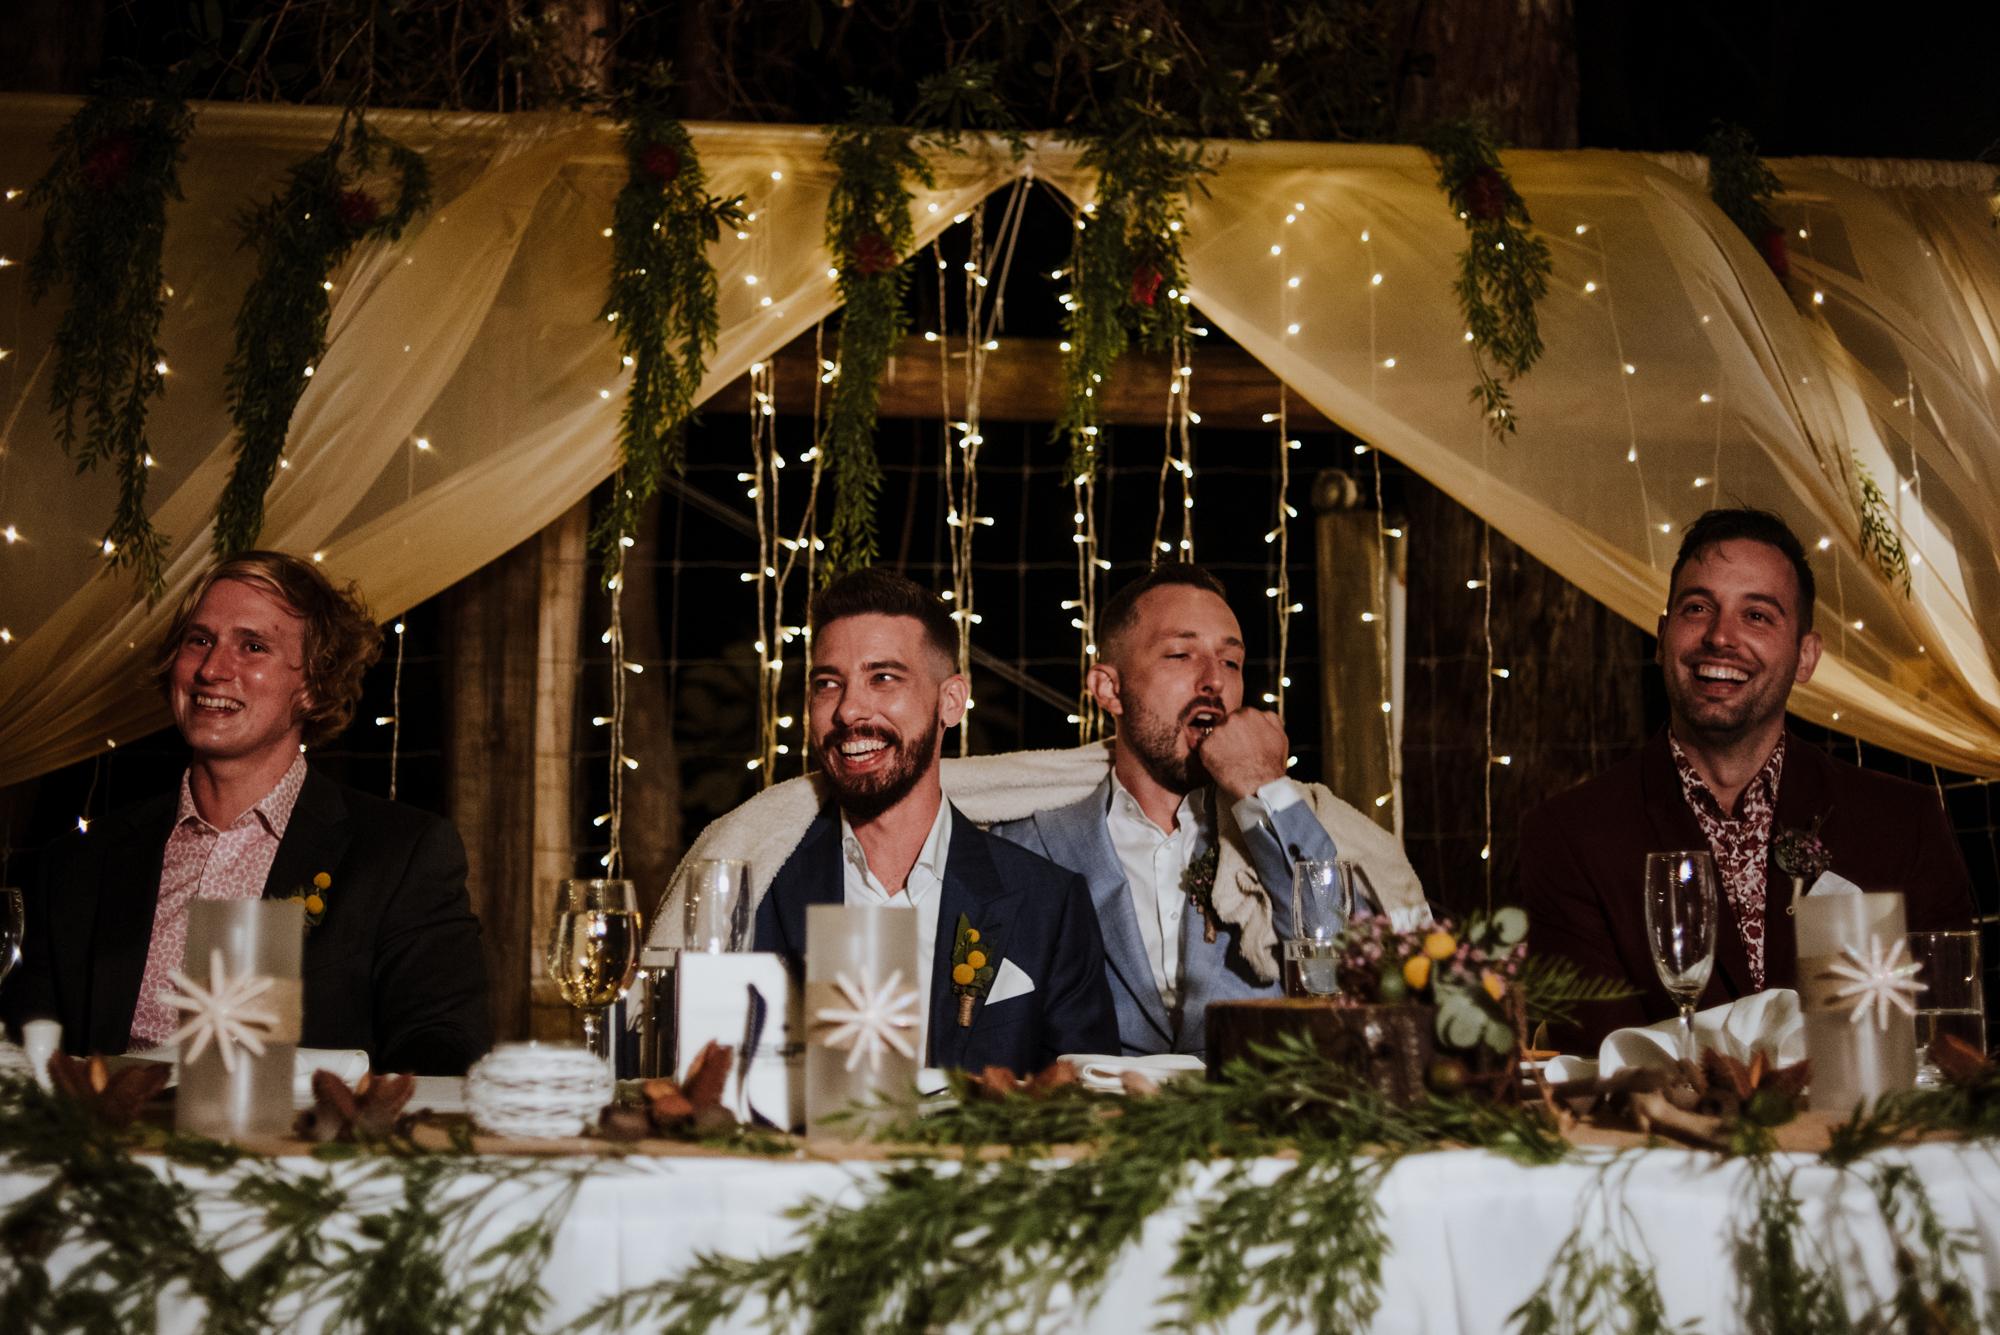 jessica-howard-photography-sean-alessandro-wedding-day-web-490.jpg